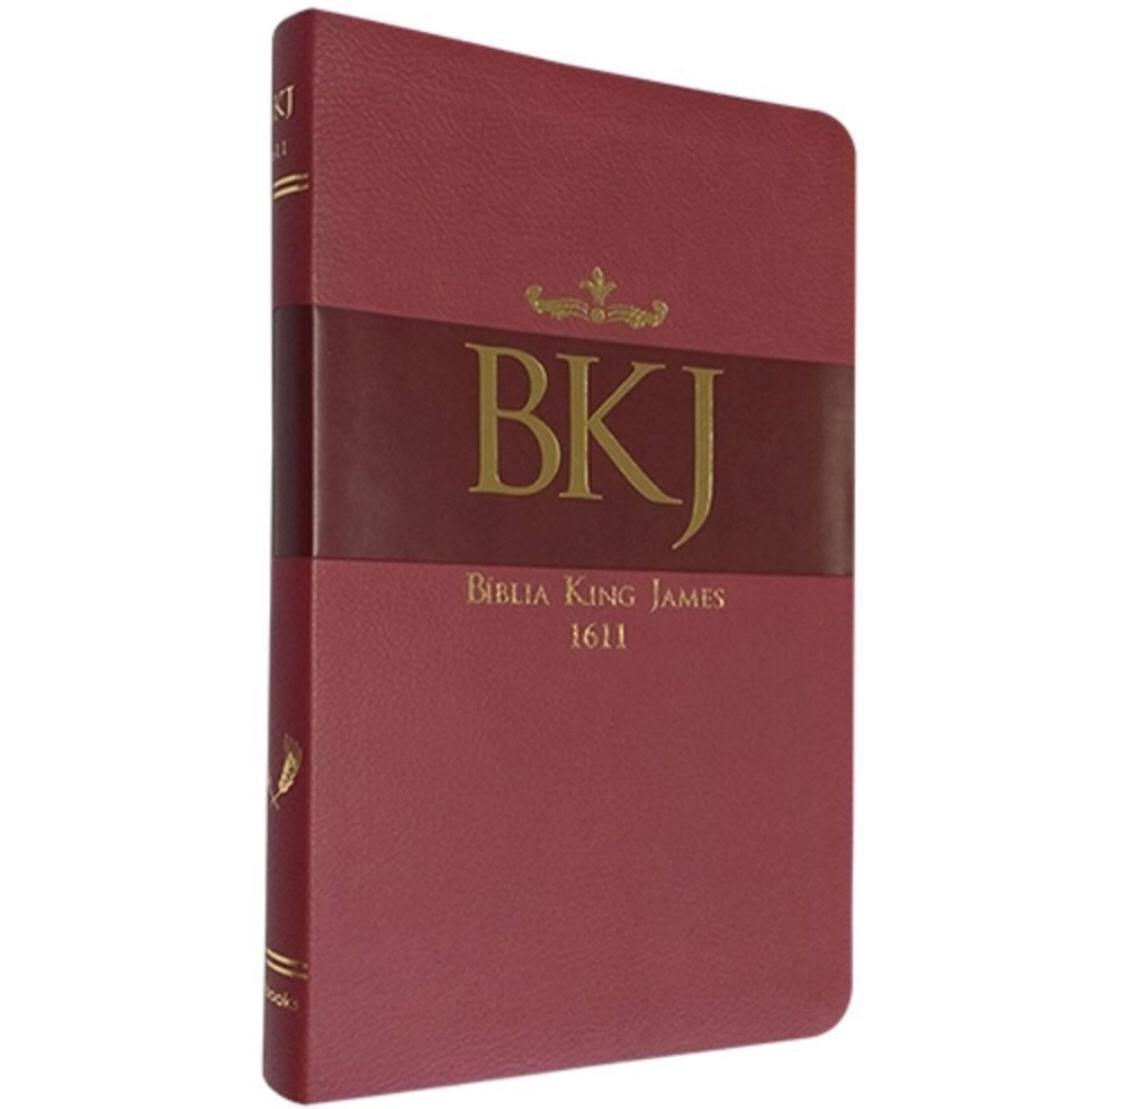 BIBLIA BKJ FIEL 1611 ULTRA FINA - LUXO VERMELHA